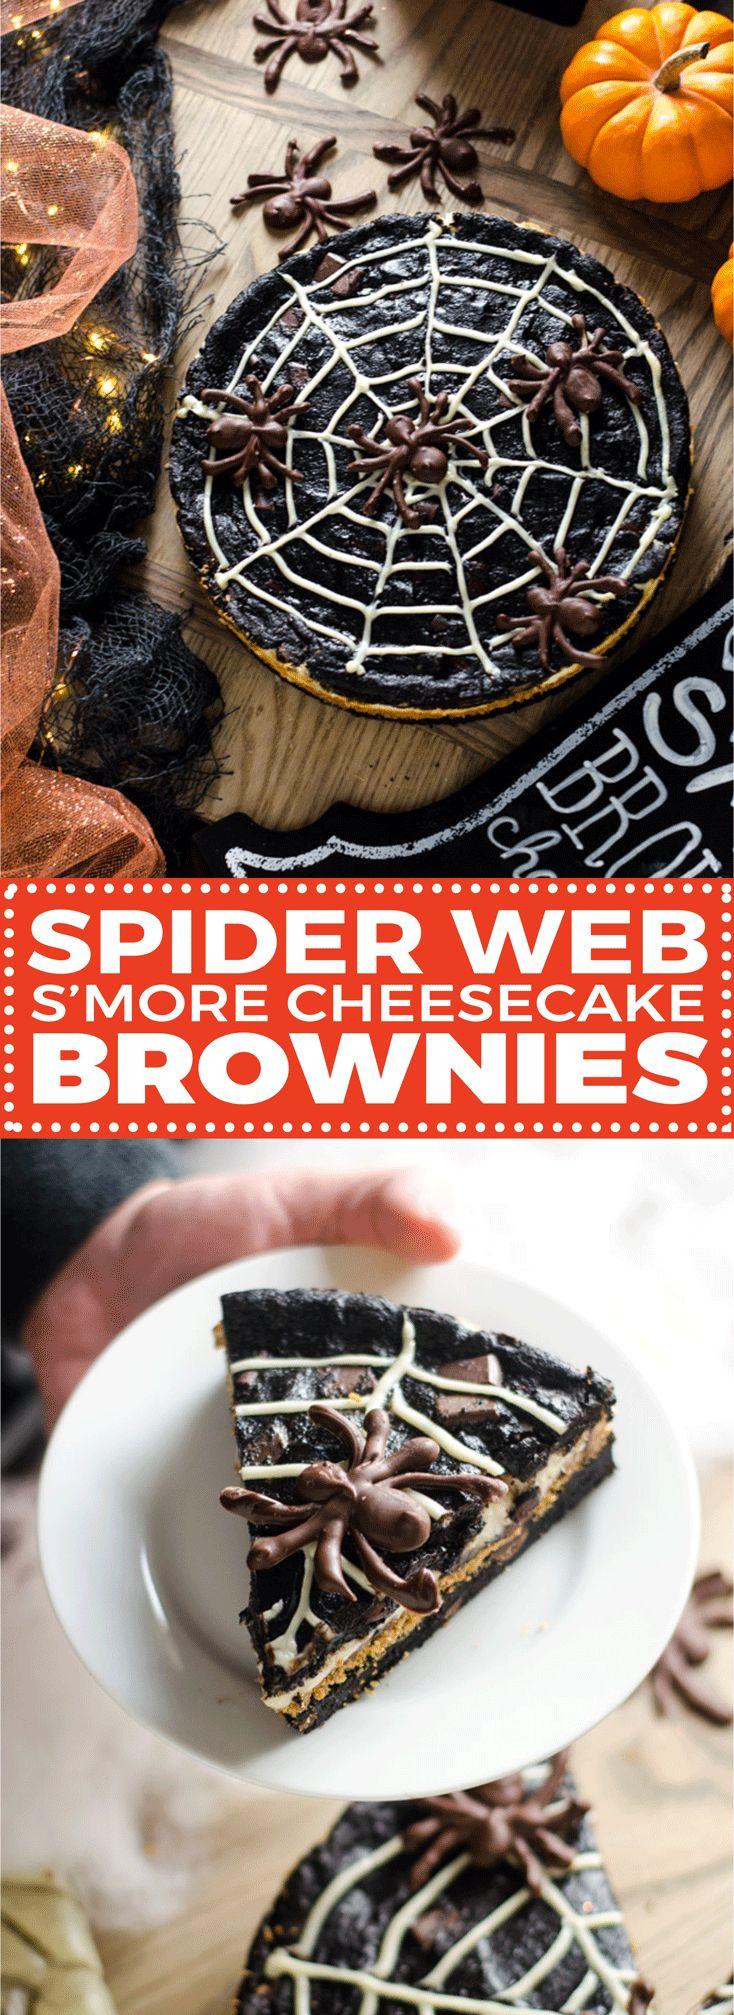 spider web smore cheesecake brownies halloween dessertshalloween fun halloween treatschocolate spidersdark - Halloween Chocolate Spiders